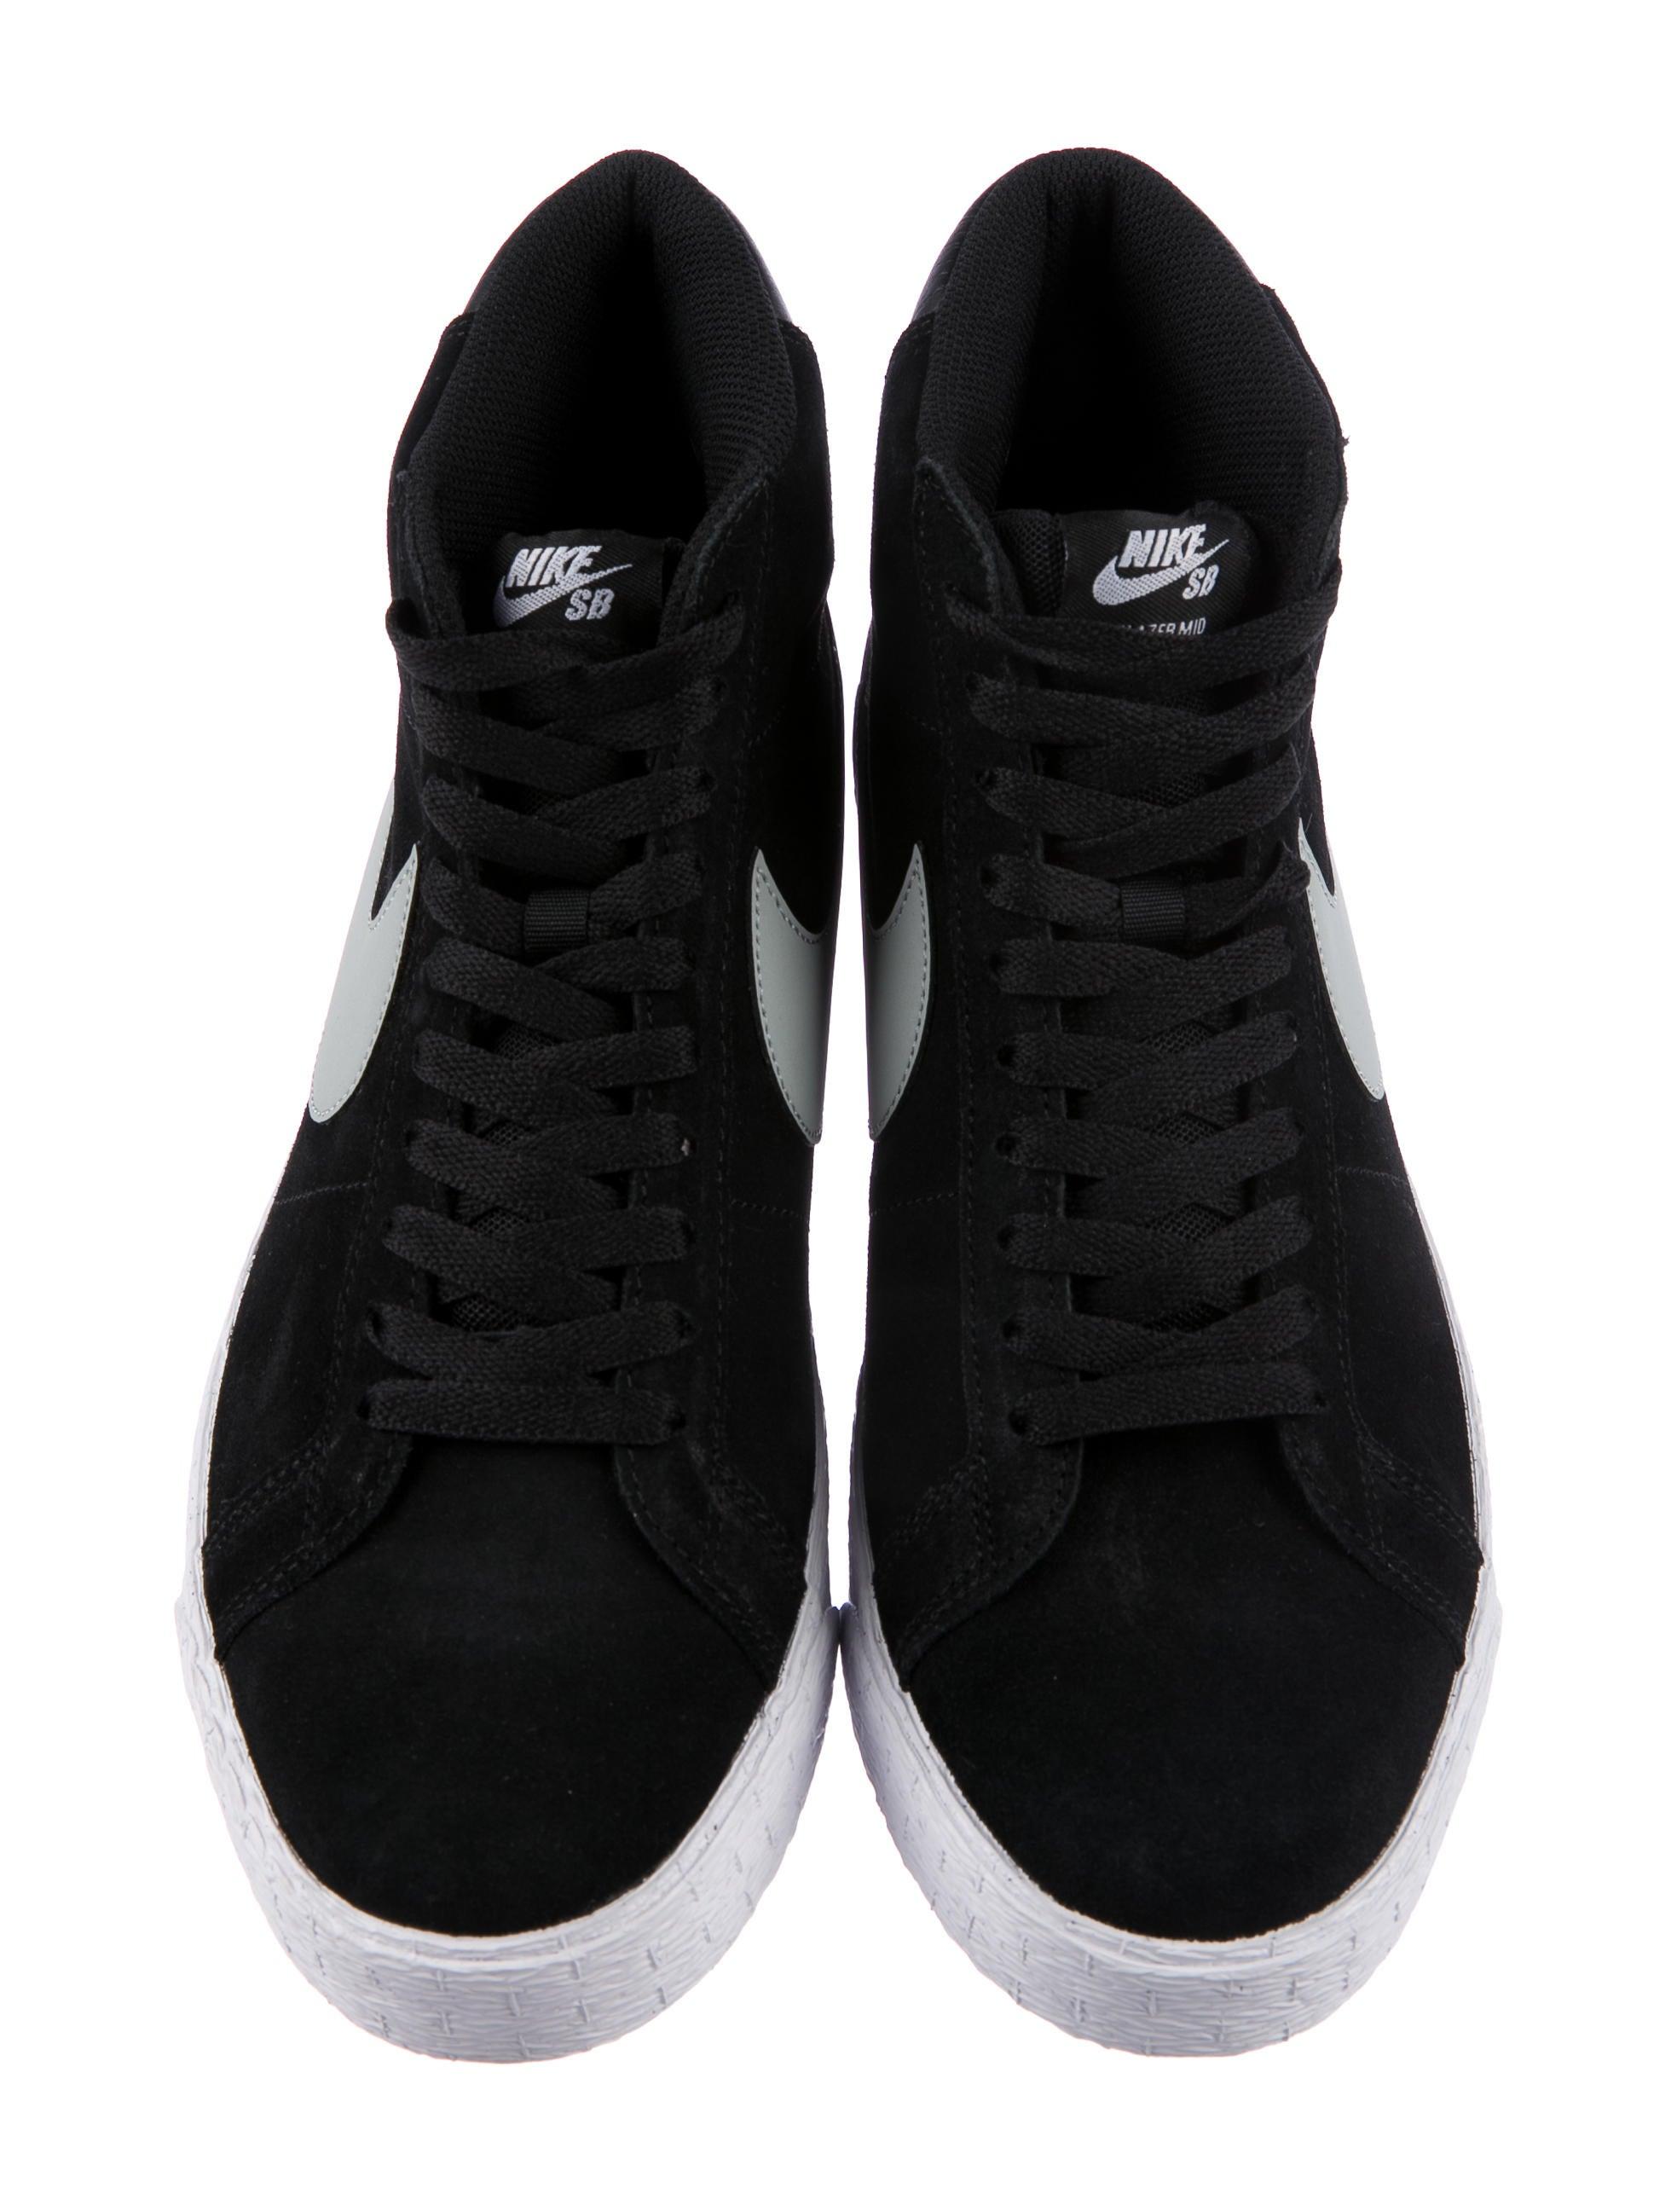 the latest 83747 cc942 SB Blazer Mid Premium Sneakers